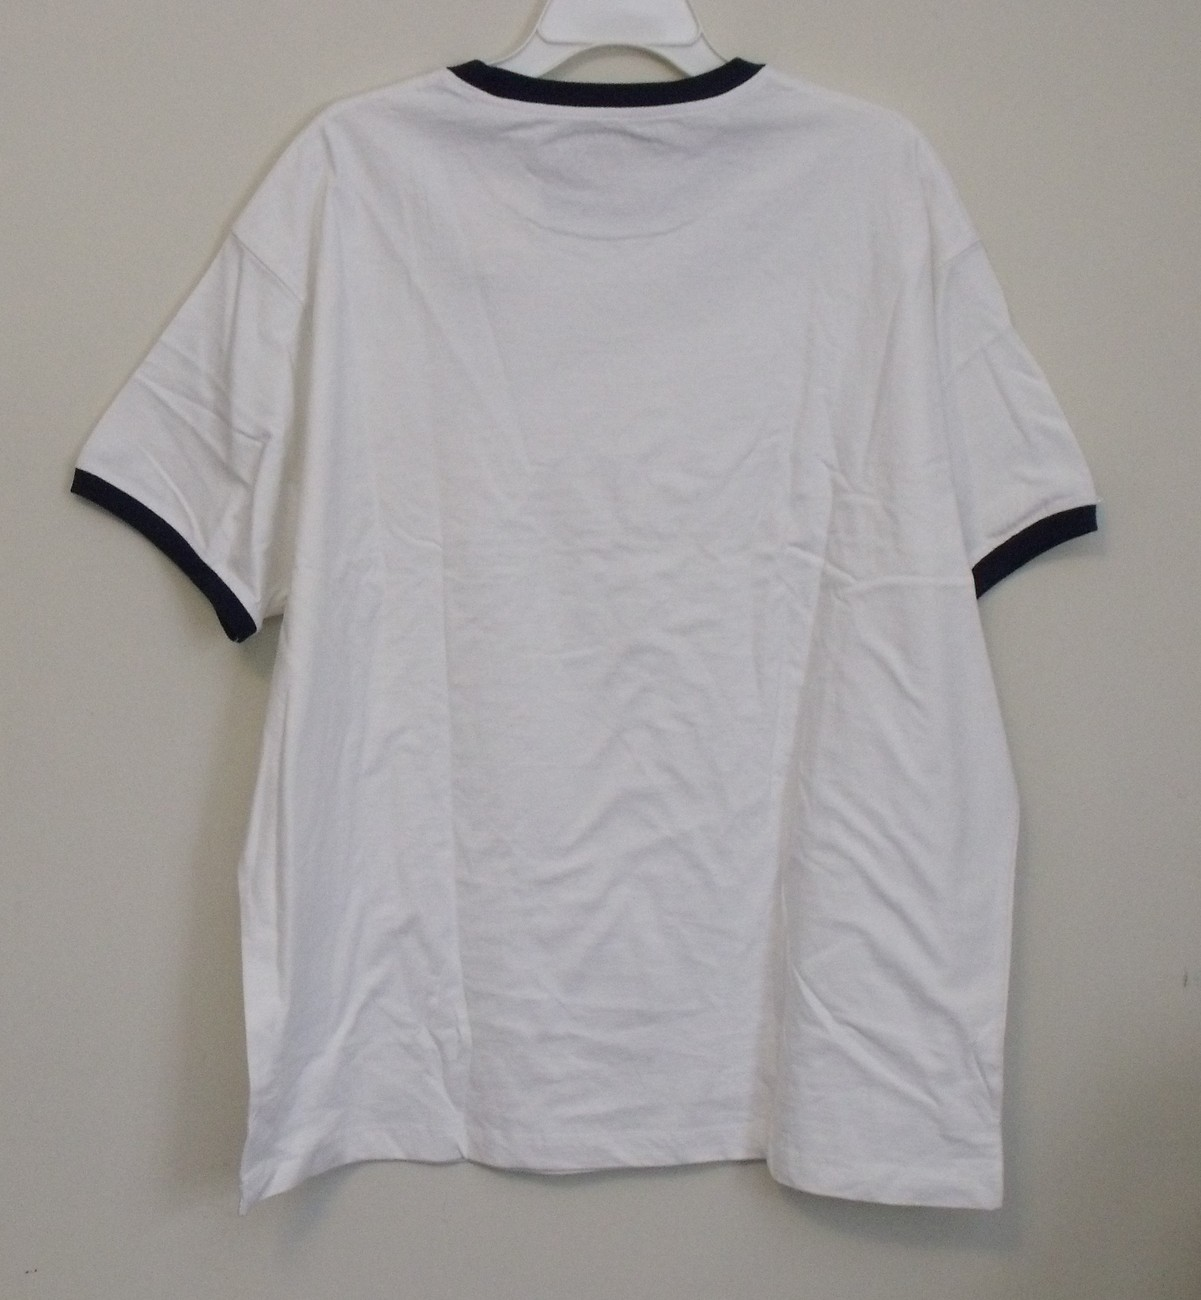 Mens St Johns Bay NWT White Navy Blue Trim Short Sleeve T Shirt Size XL